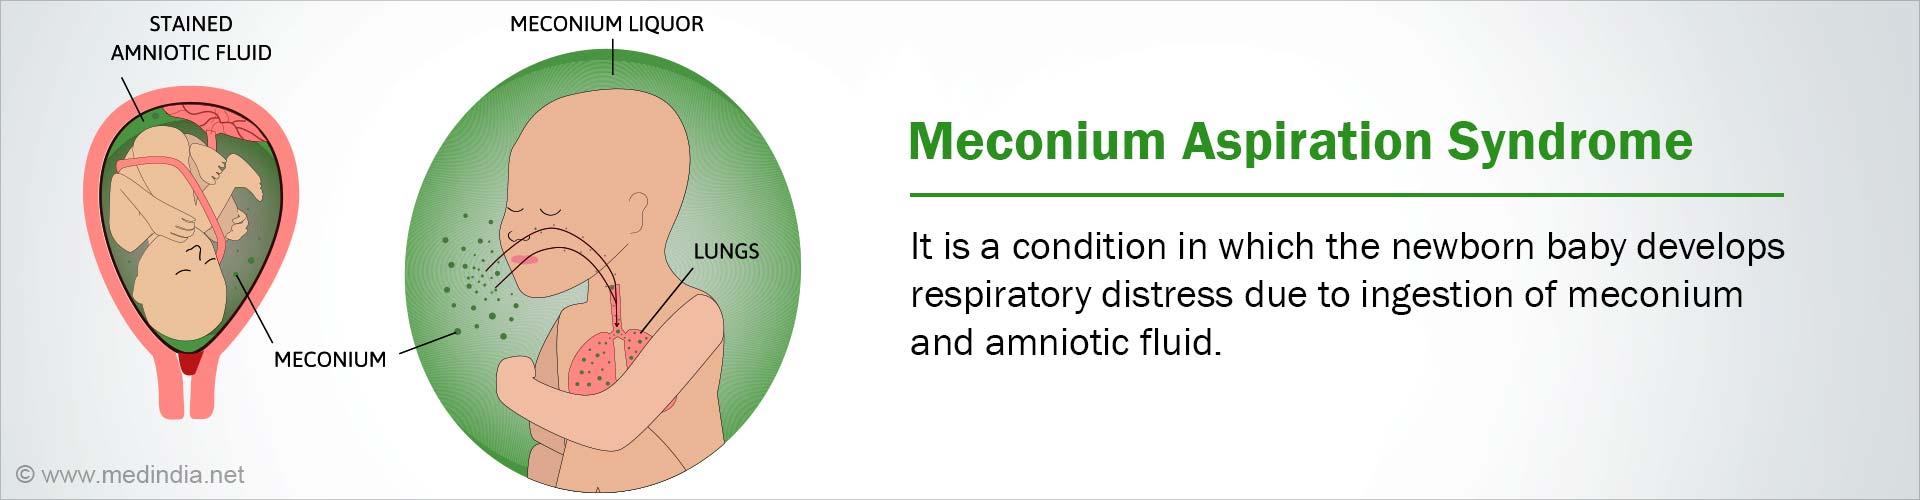 Meconium Aspiration Syndrome - Causes, Symptoms, Diagnosis, Complications, Treatment